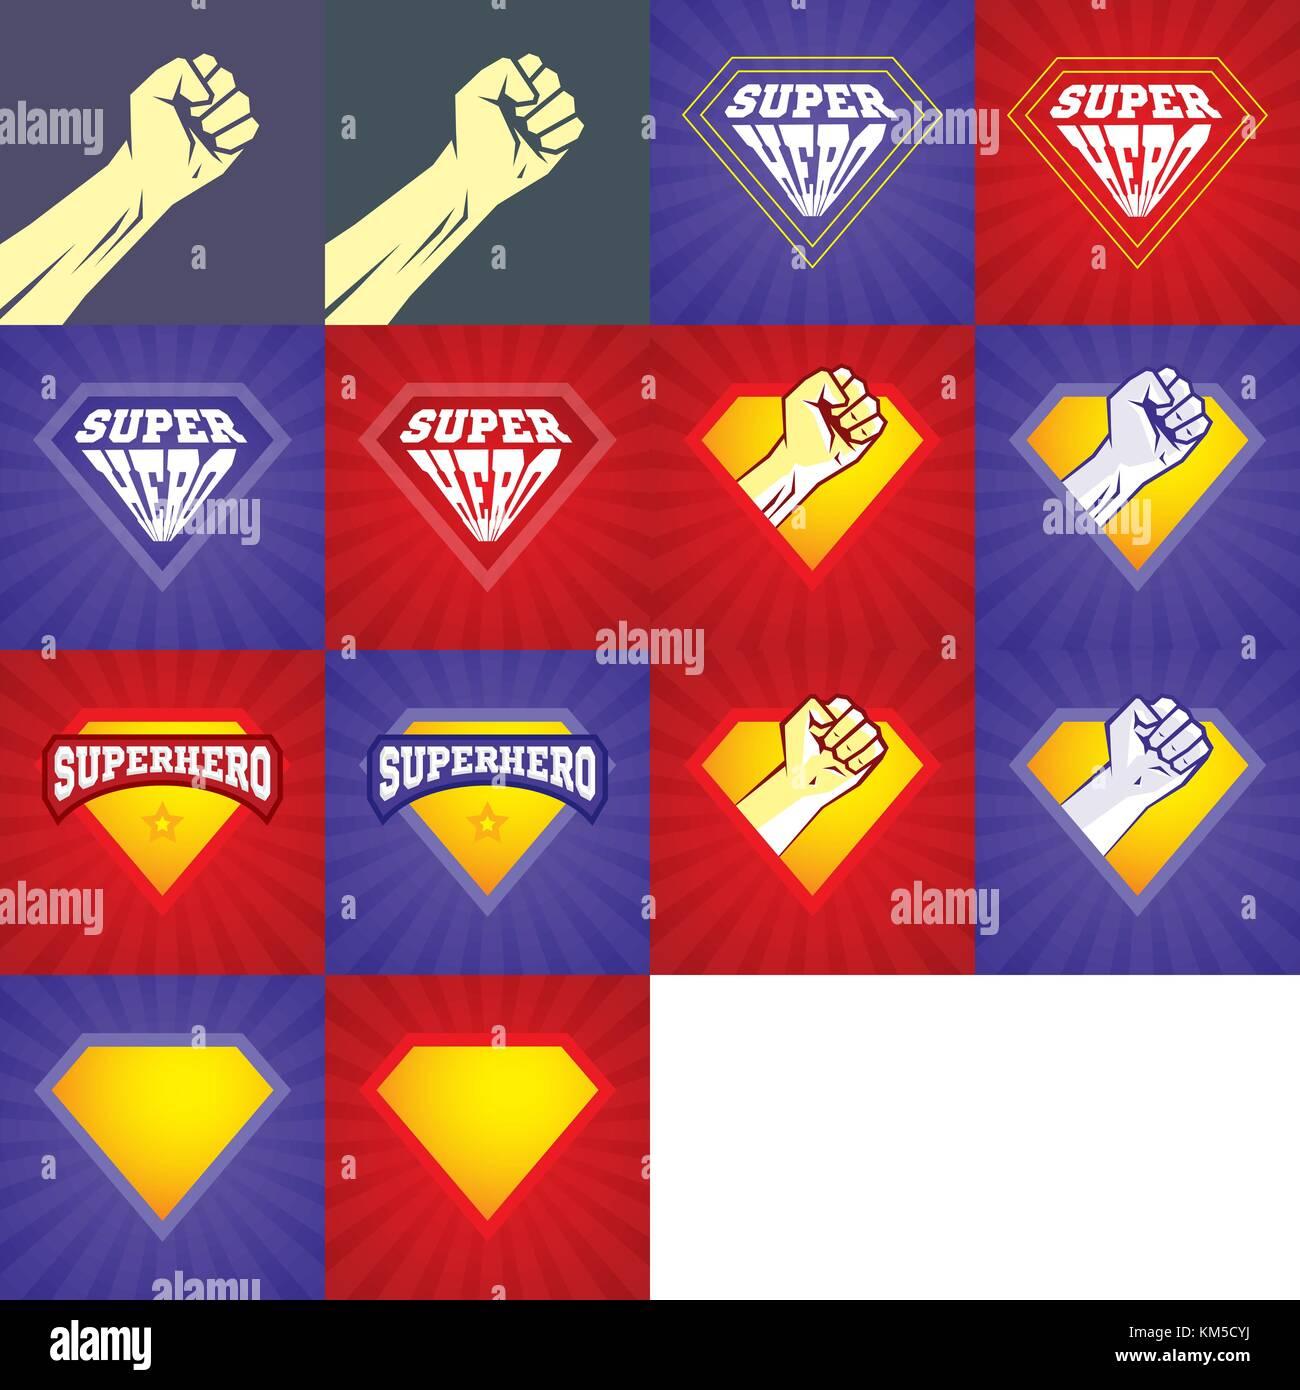 Superhelden logo-Element Vorlage. Vektor Superhelden Symbol Vektor ...